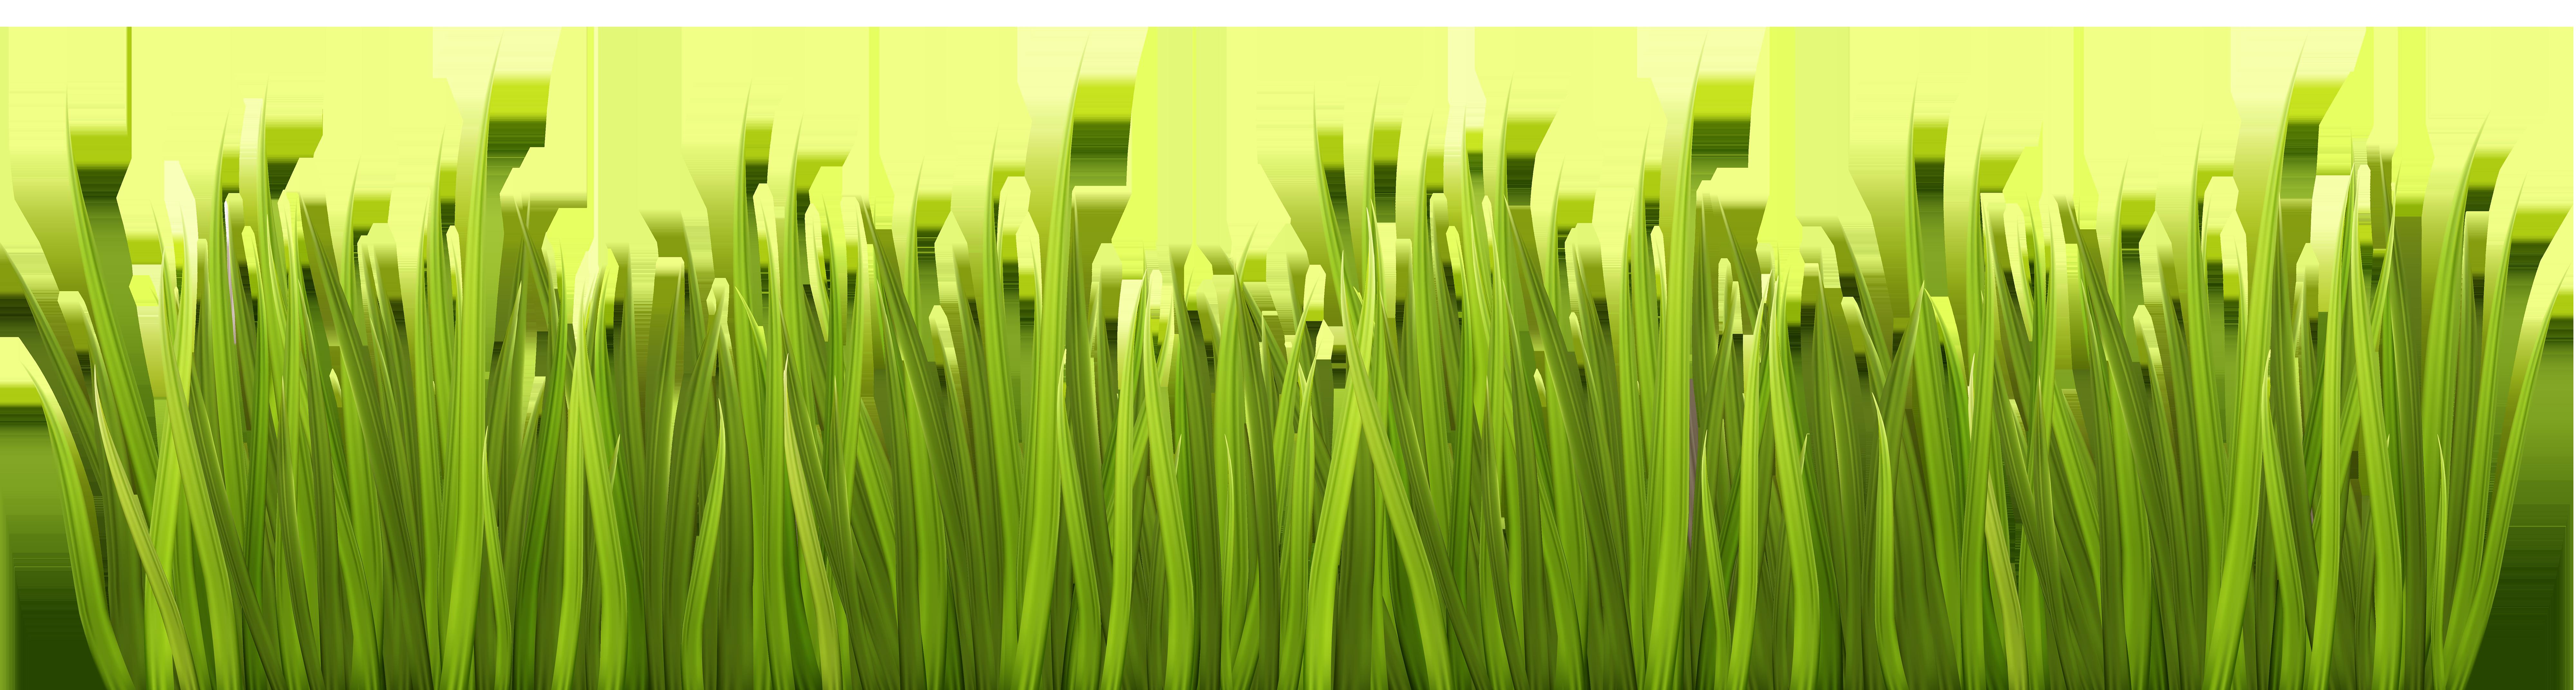 spring grass png transparent